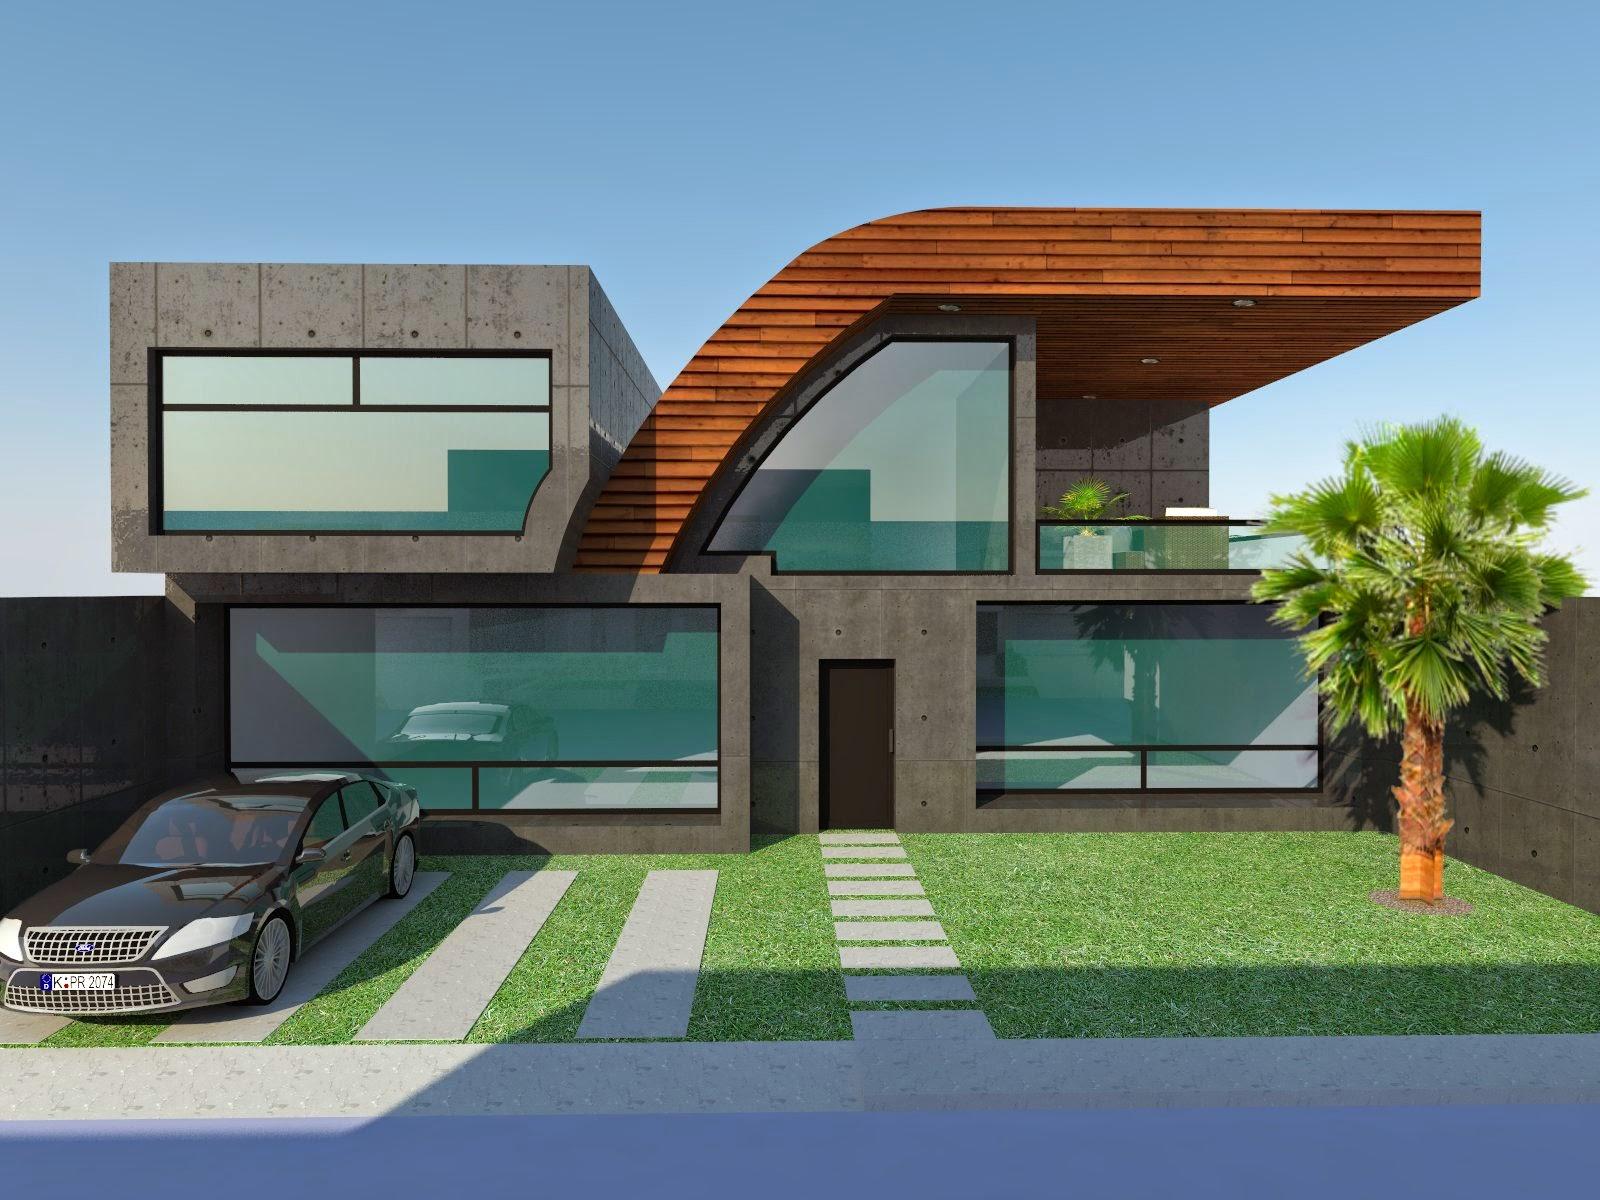 Arquitrec fachadas de casas minimalistas creadas en arquitrec for Render casa minimalista